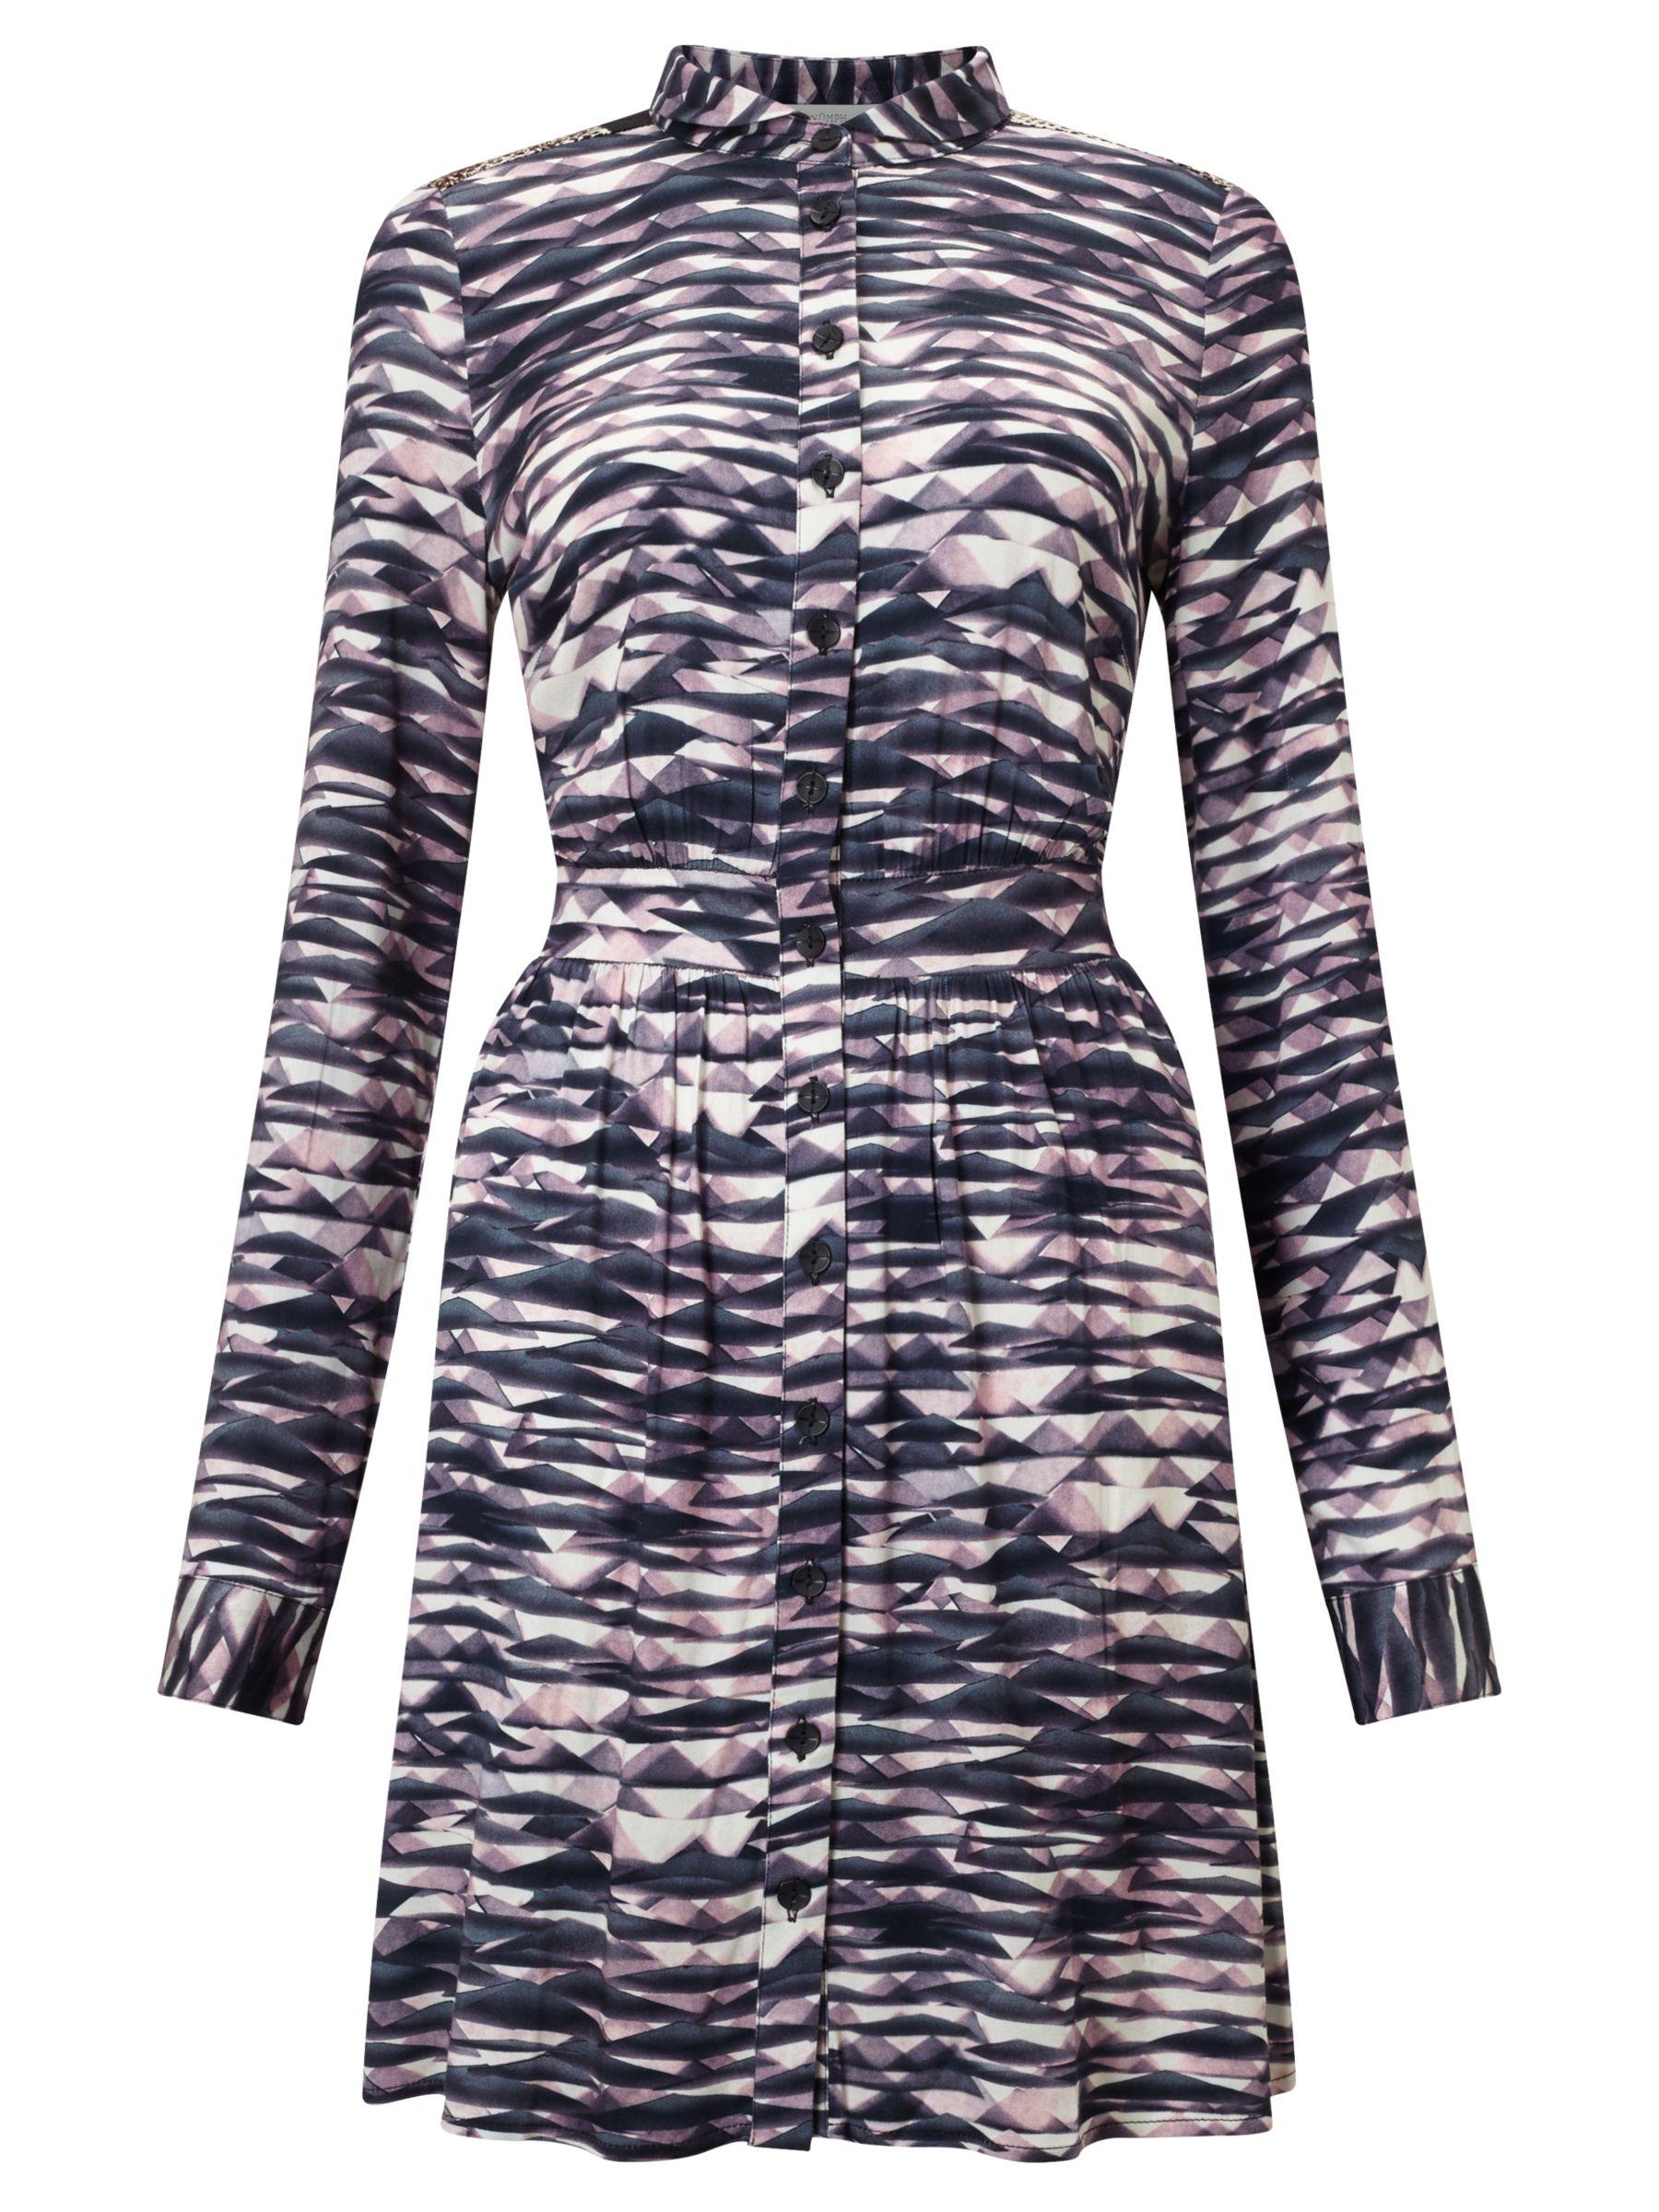 Numph Numph Josefin Printed Shirt Dress, Multi